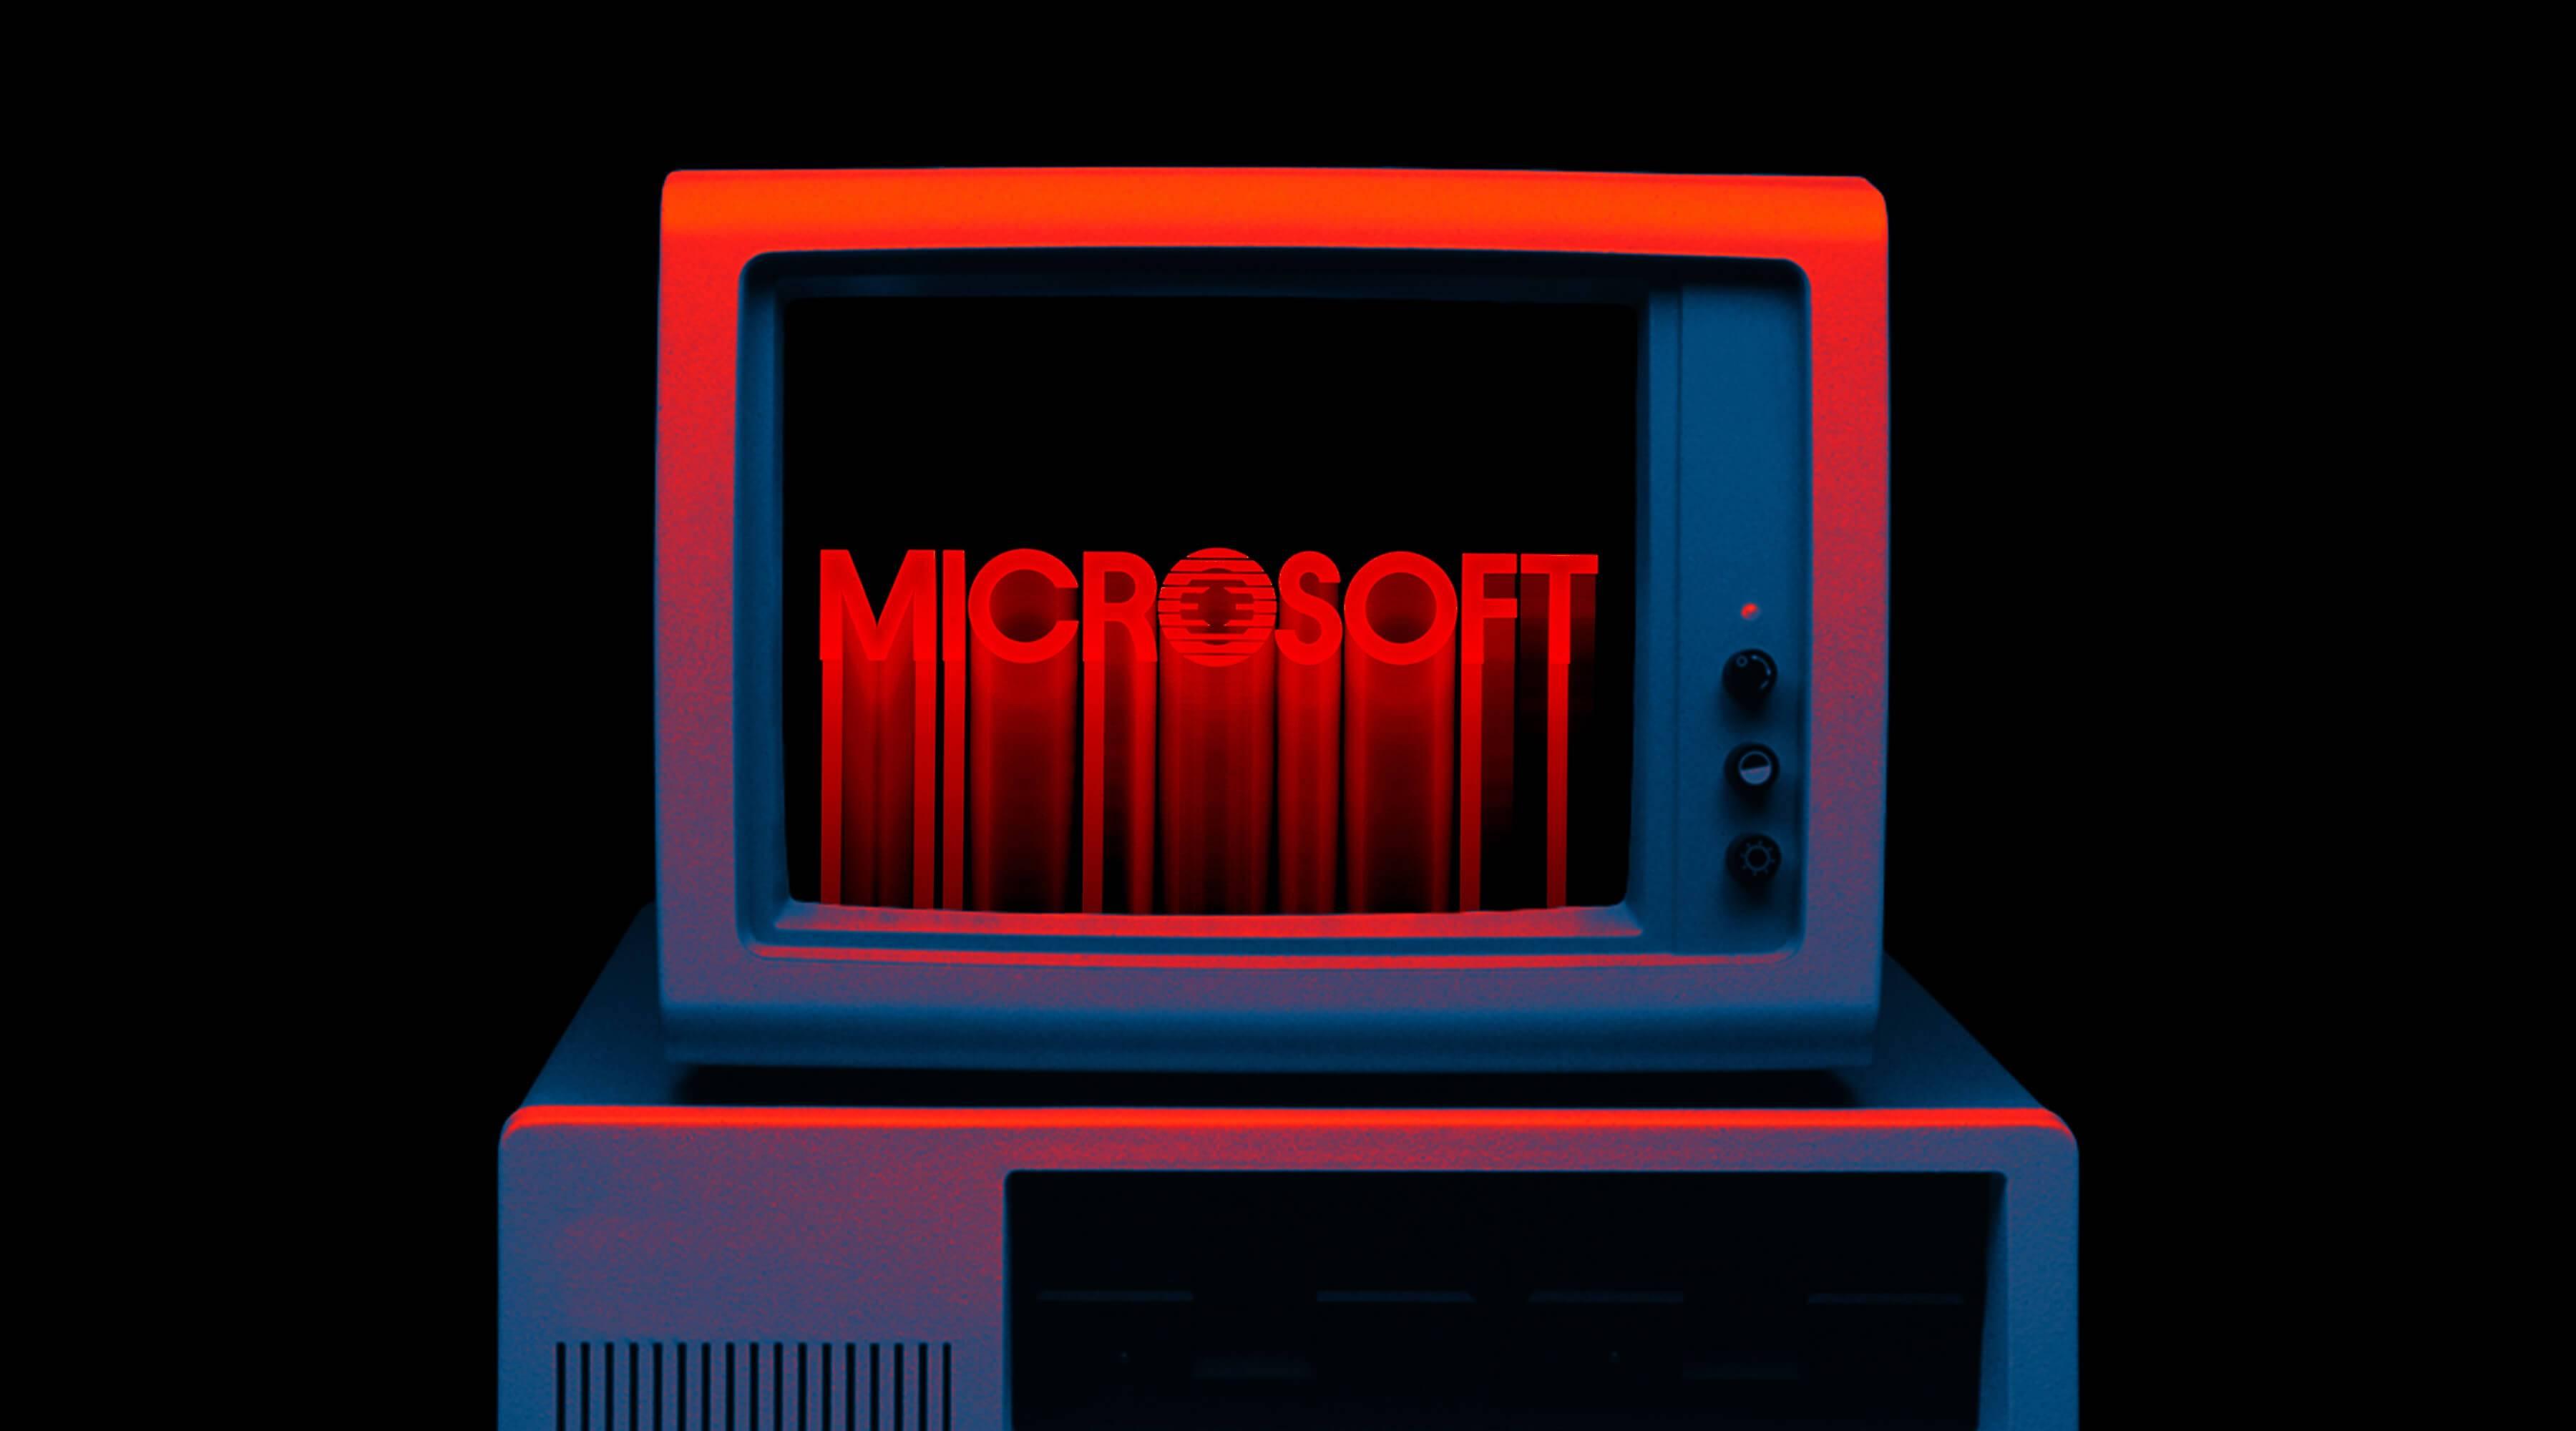 Microsoft-red.jpg